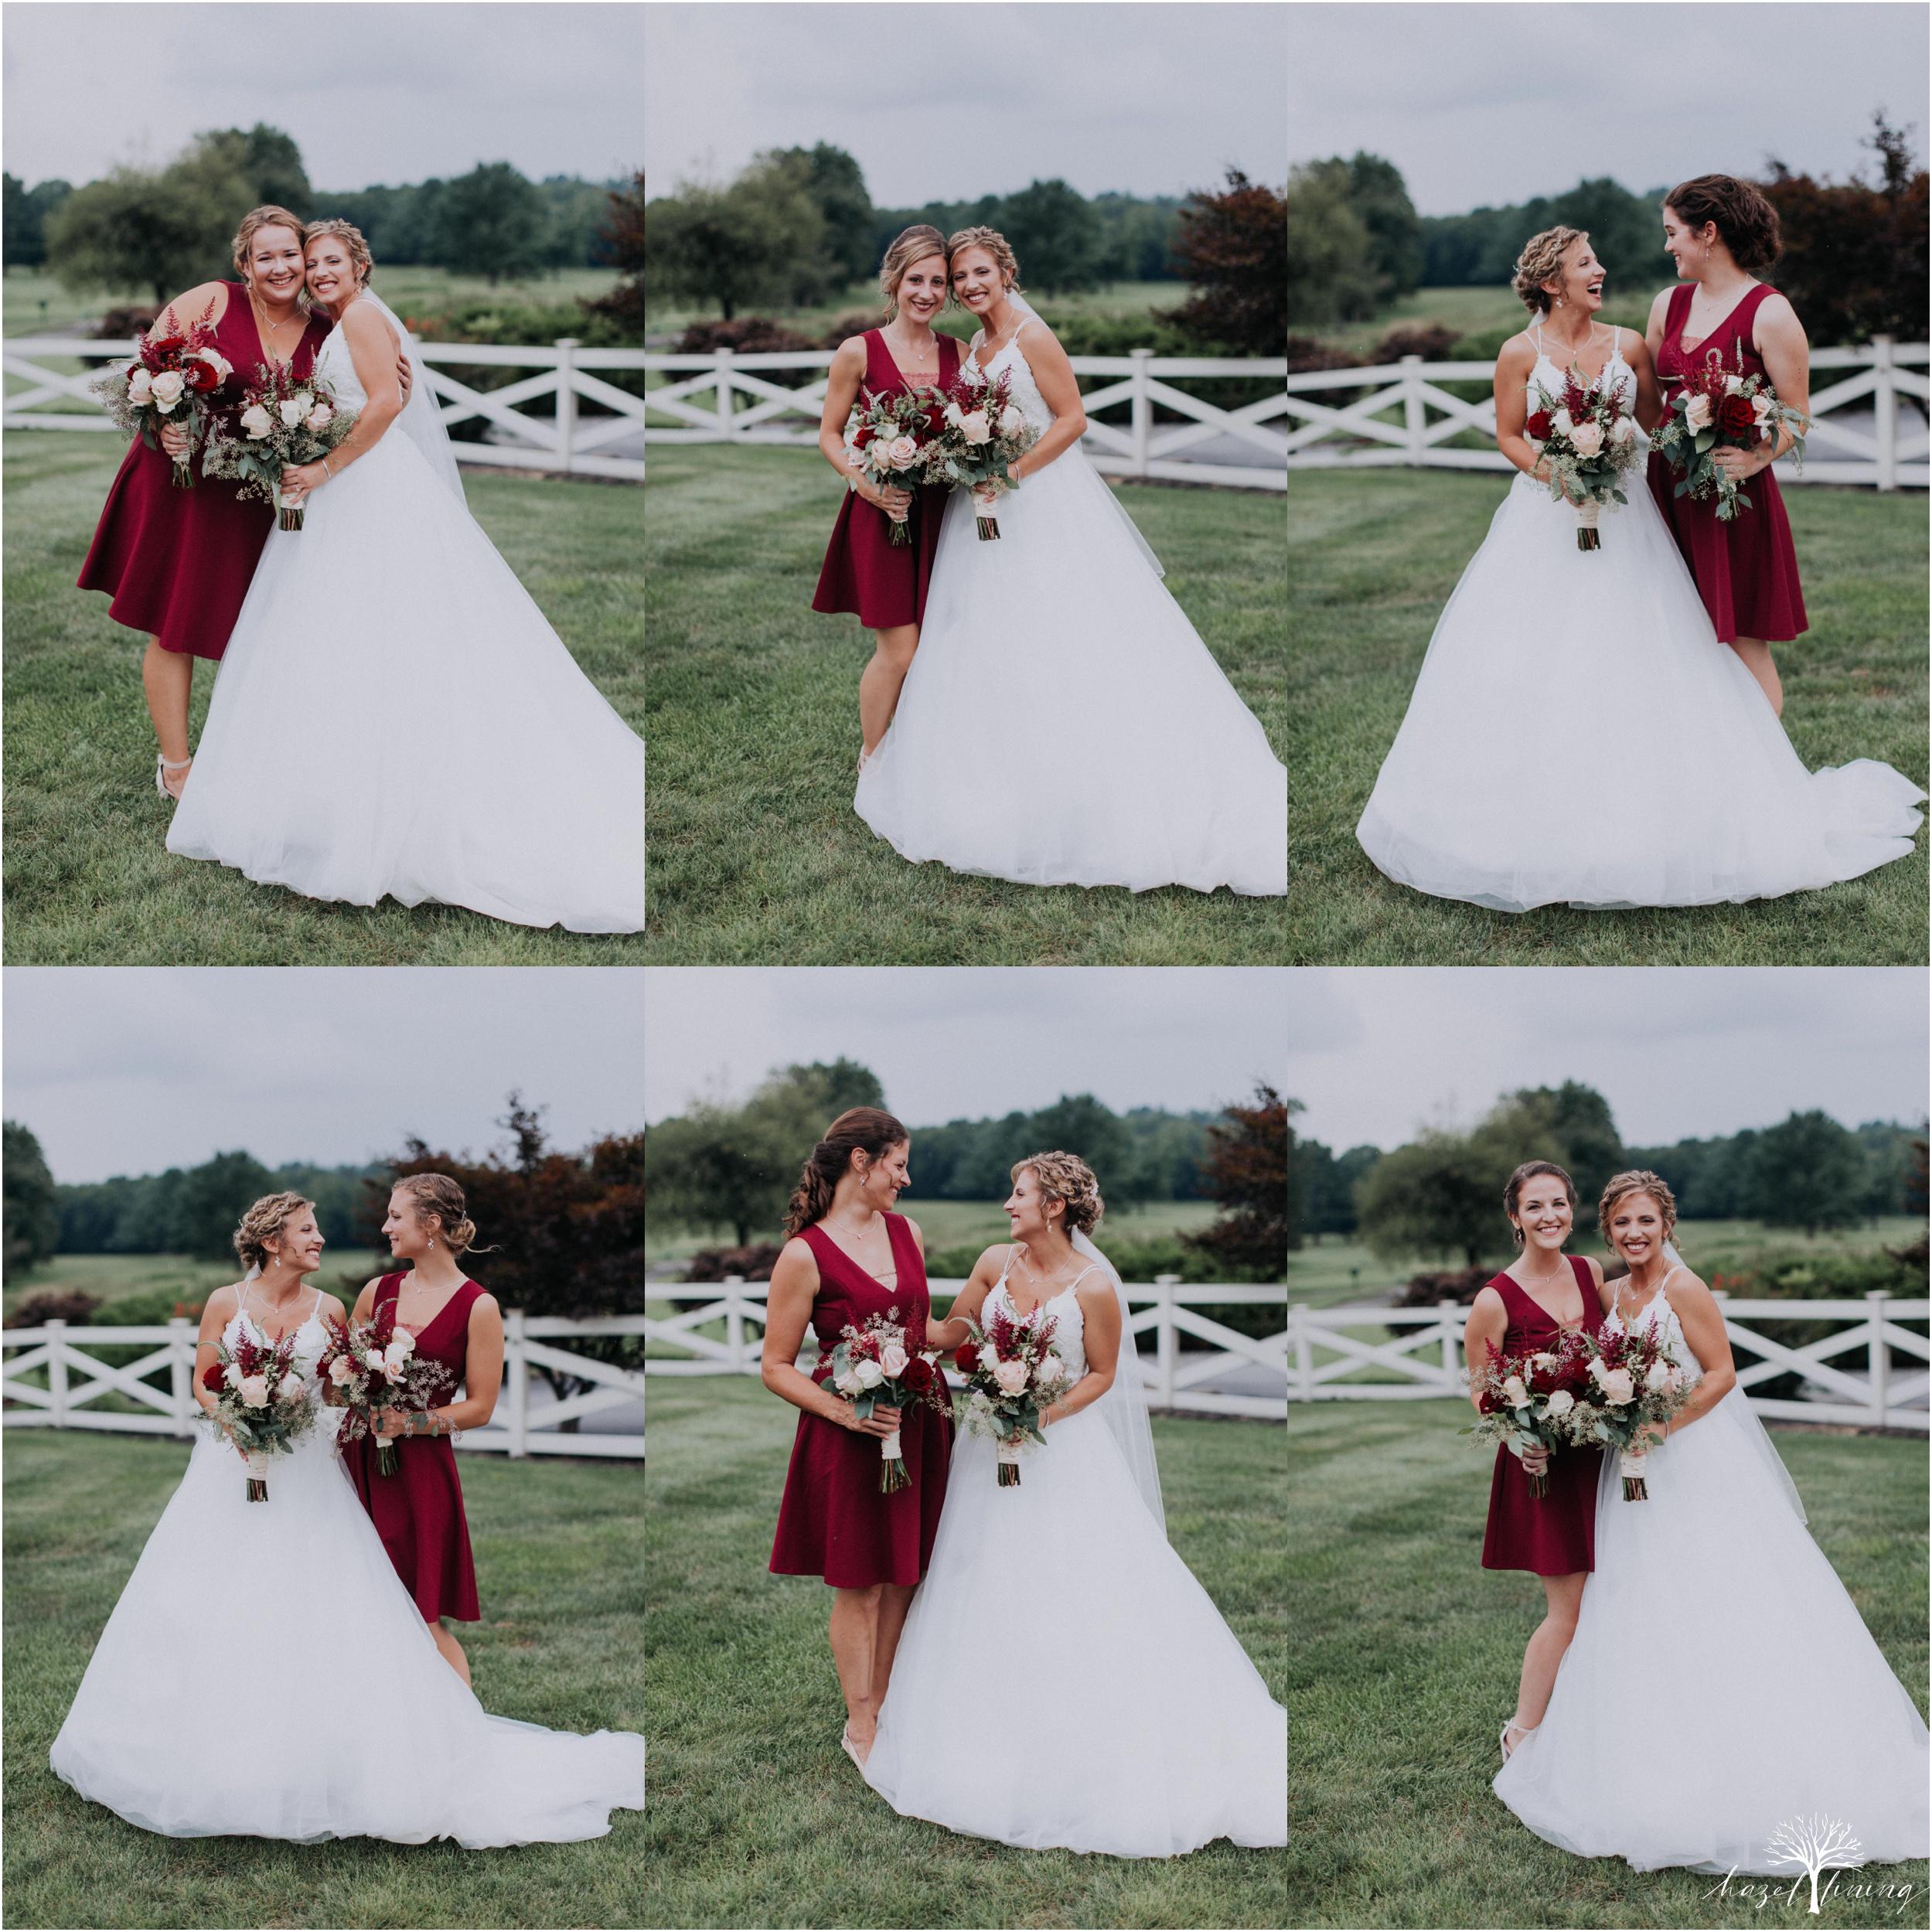 jonathan-weibel-becky-haywood-loft-at-sweetwater-cc-pennsburg-pennsylvania-rainy-day-summer-wedding-hazel-lining-travel-wedding-elopement-photography_0033.jpg